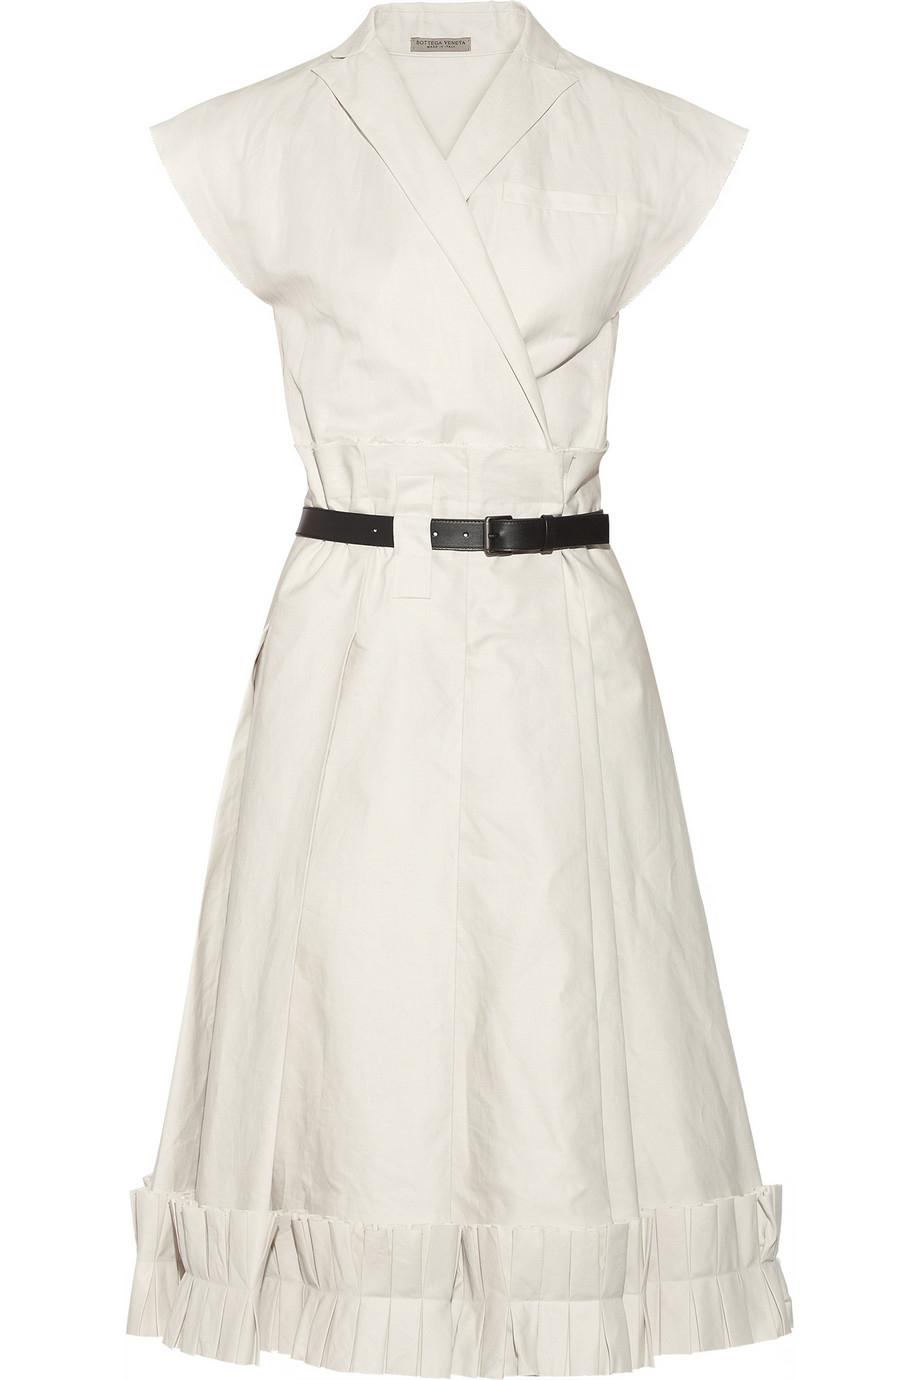 Lyst Bottega Veneta Pleated Cotton Blend Twill Wrap